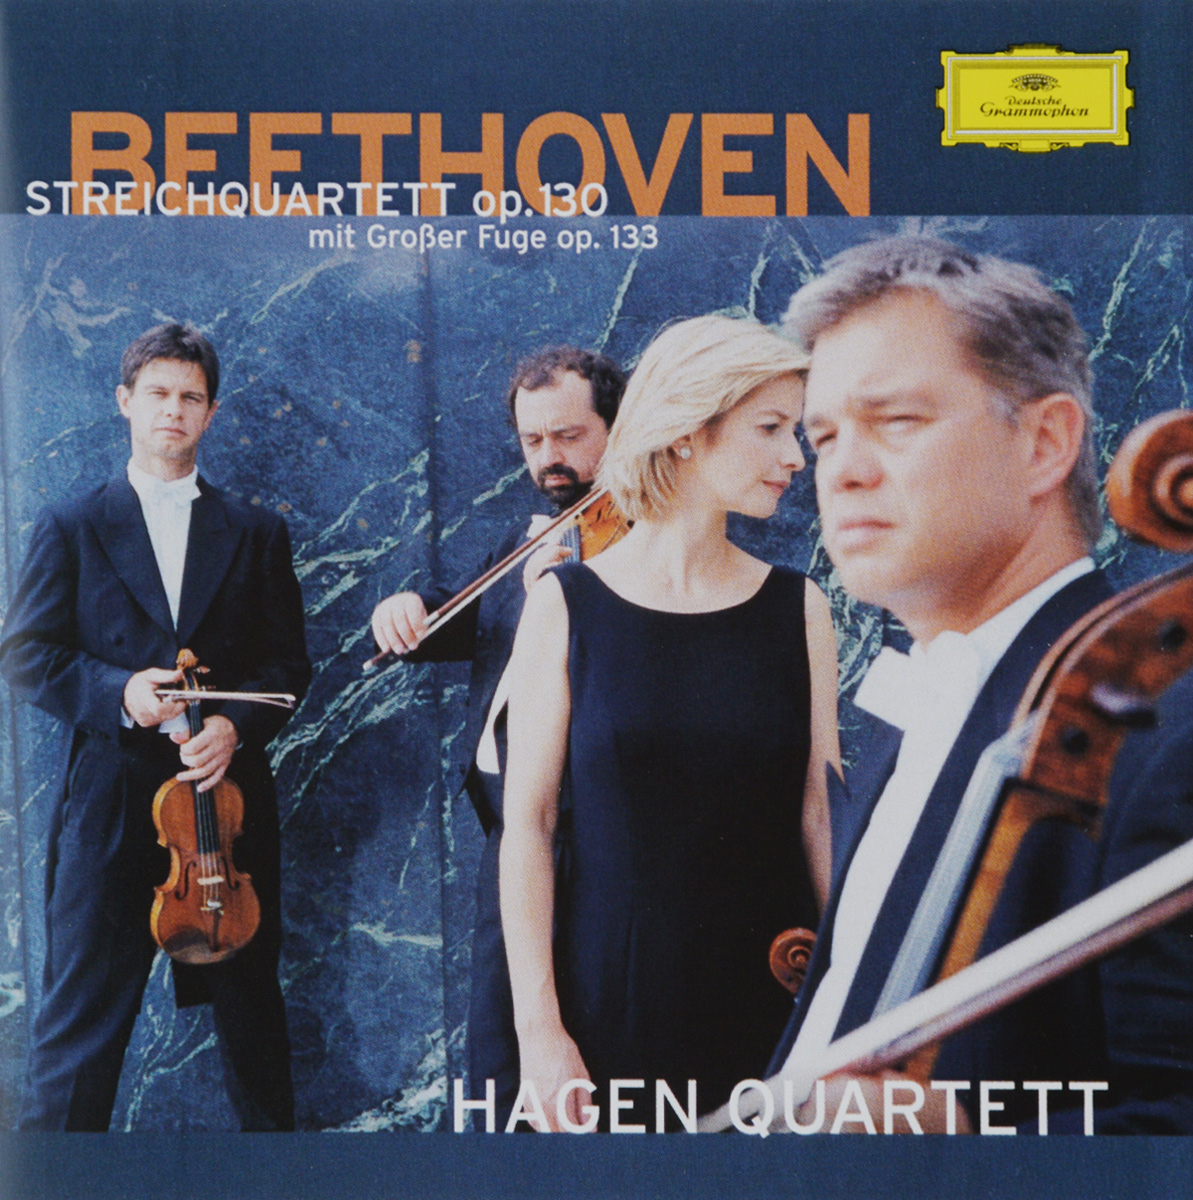 HAGEN QUARTETT. BEETHOVEN: OP. 130, OP. 133 argerich maisky beethoven cello son op 69 102